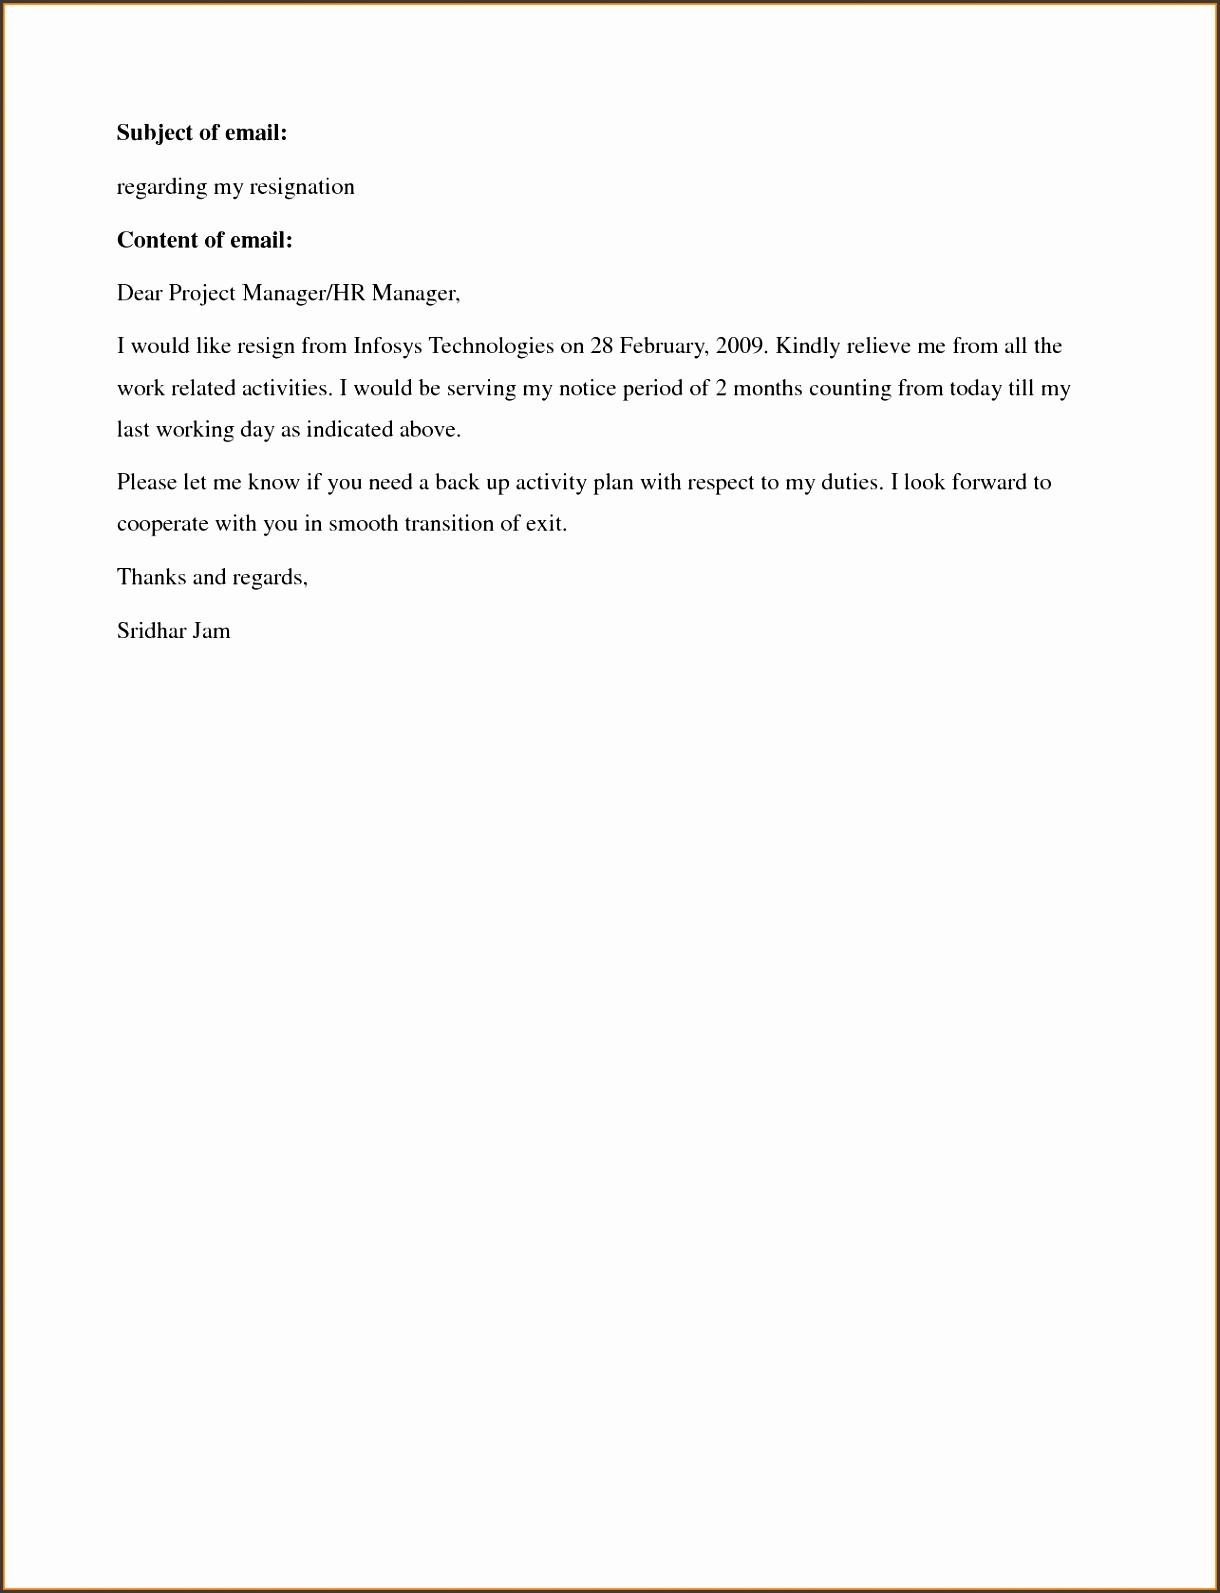 Creative Job Resignation Letter Template Uk with Additional Resignation Letter Example Resign Letter Notice e